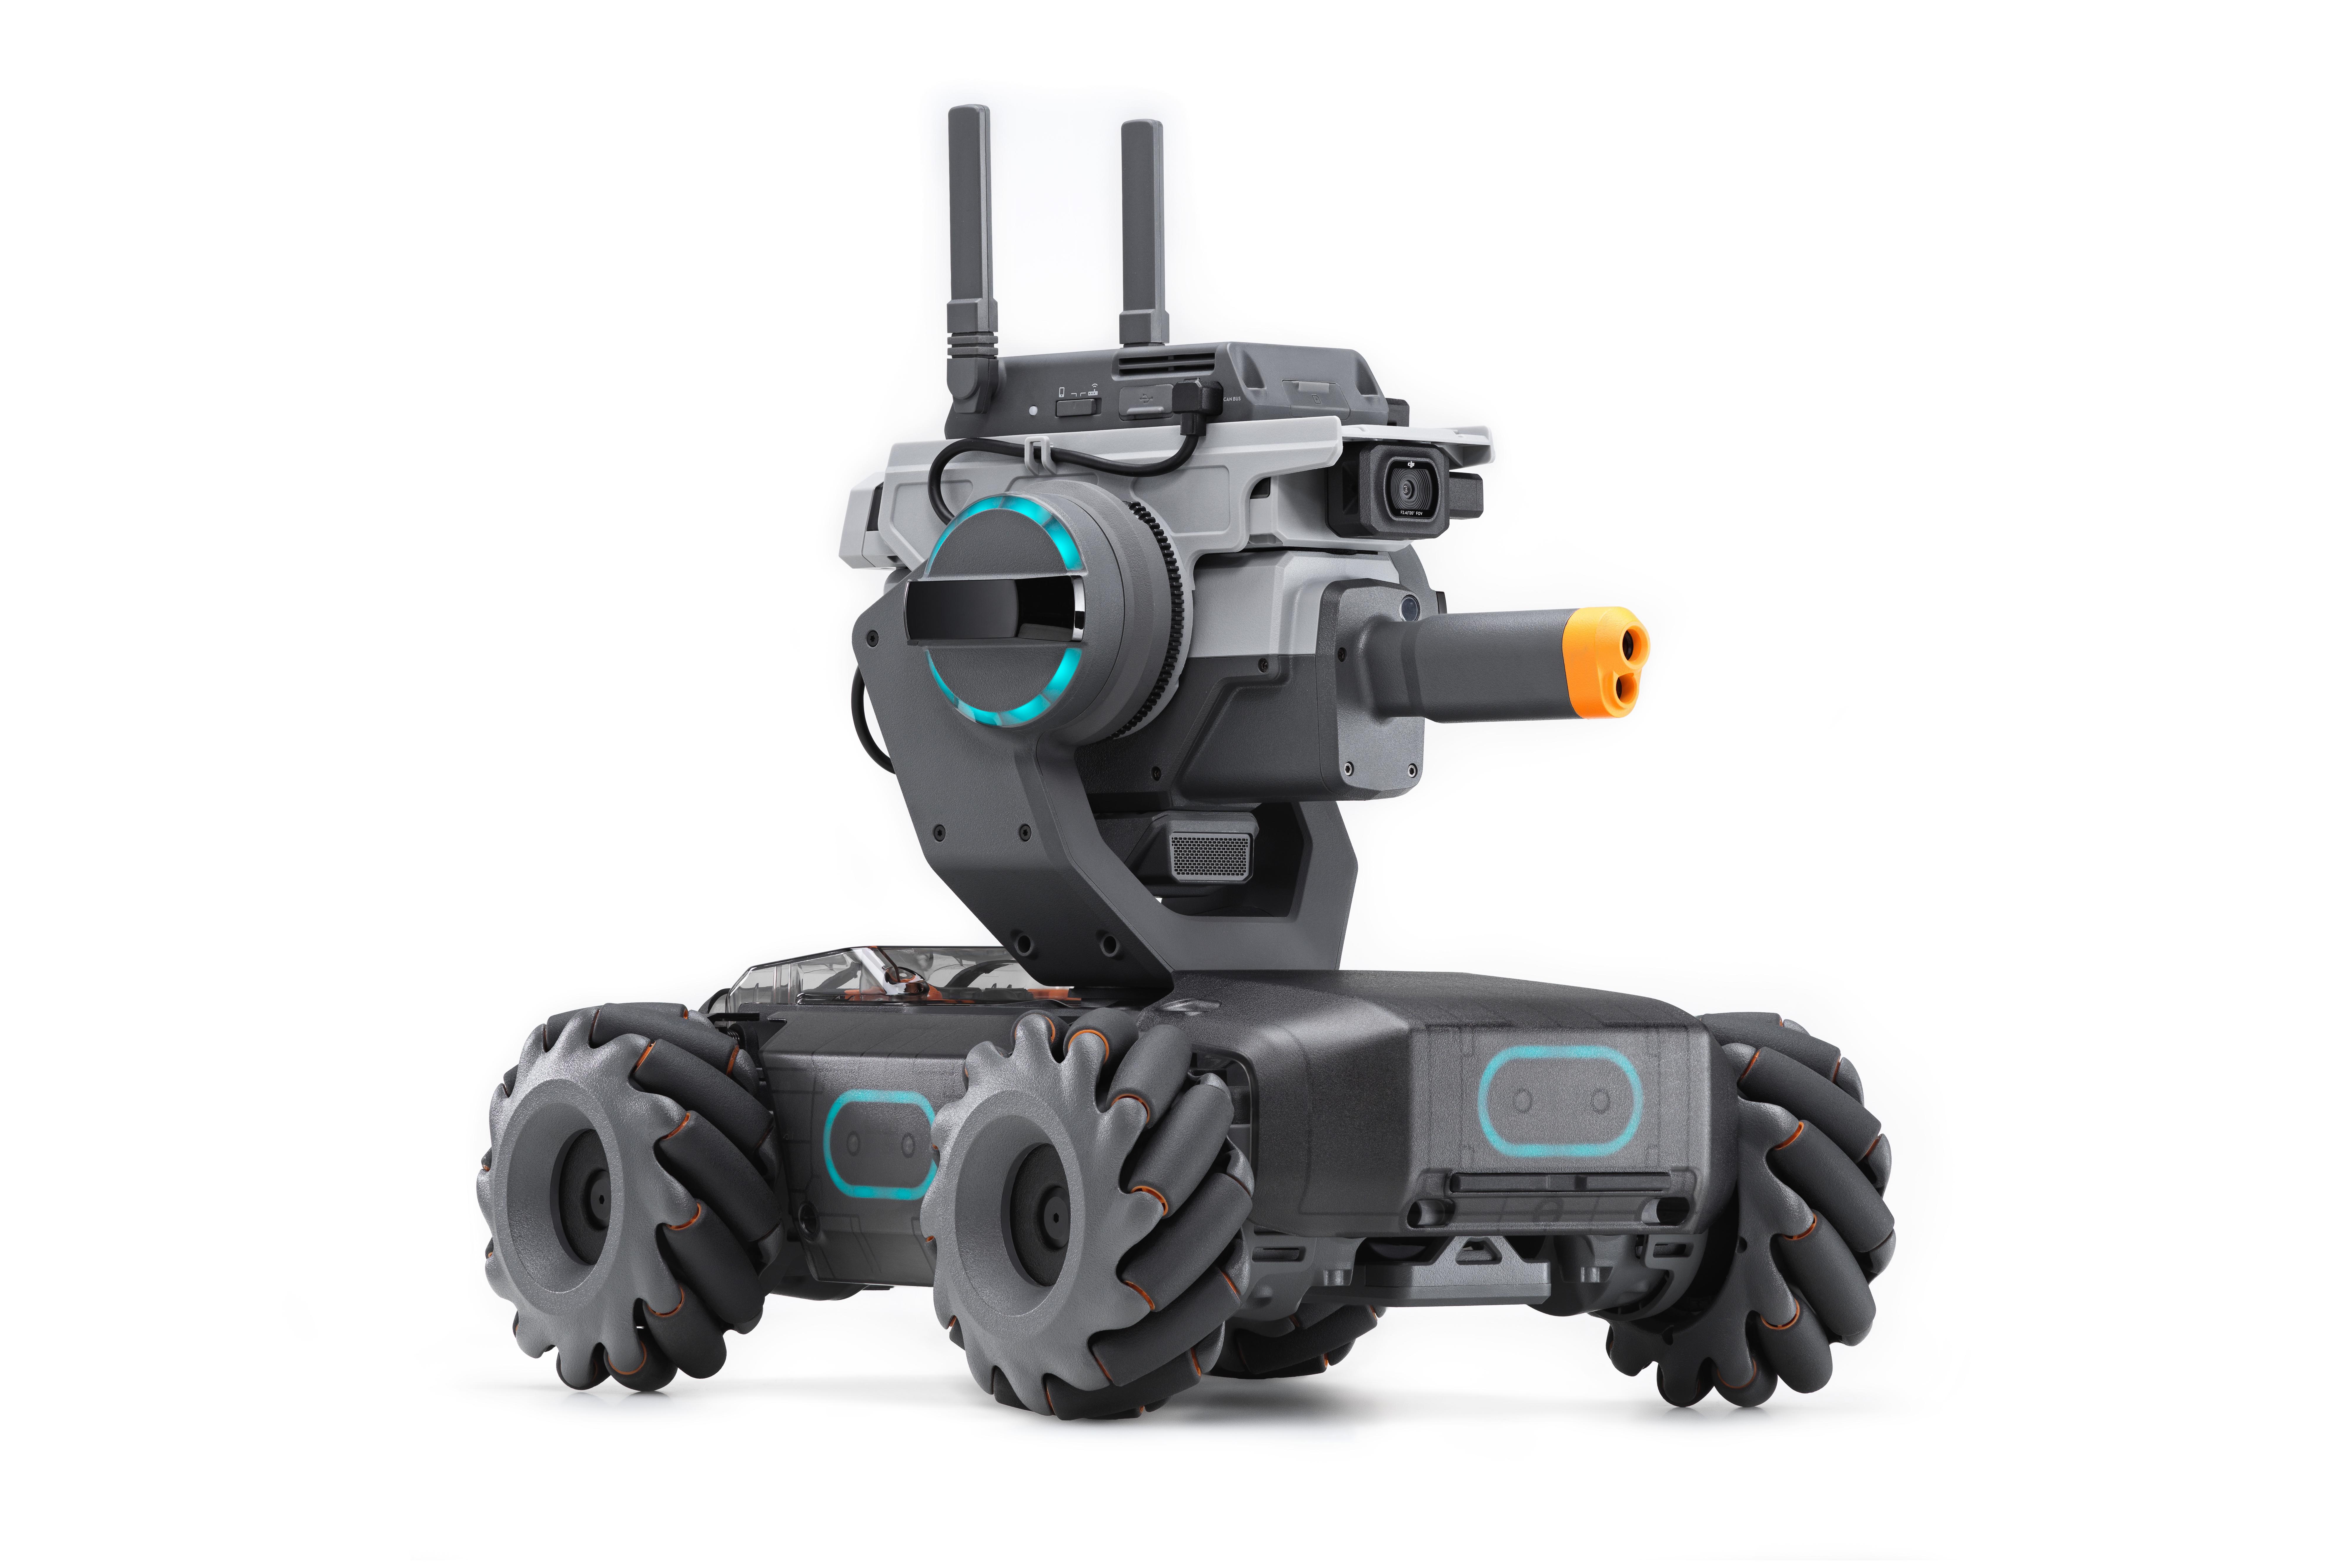 DJI RoboMaster S1 - 2,549 kg/cm - 5 MP - 360° - -10 - 40 °C - 240 mm - 320 mm